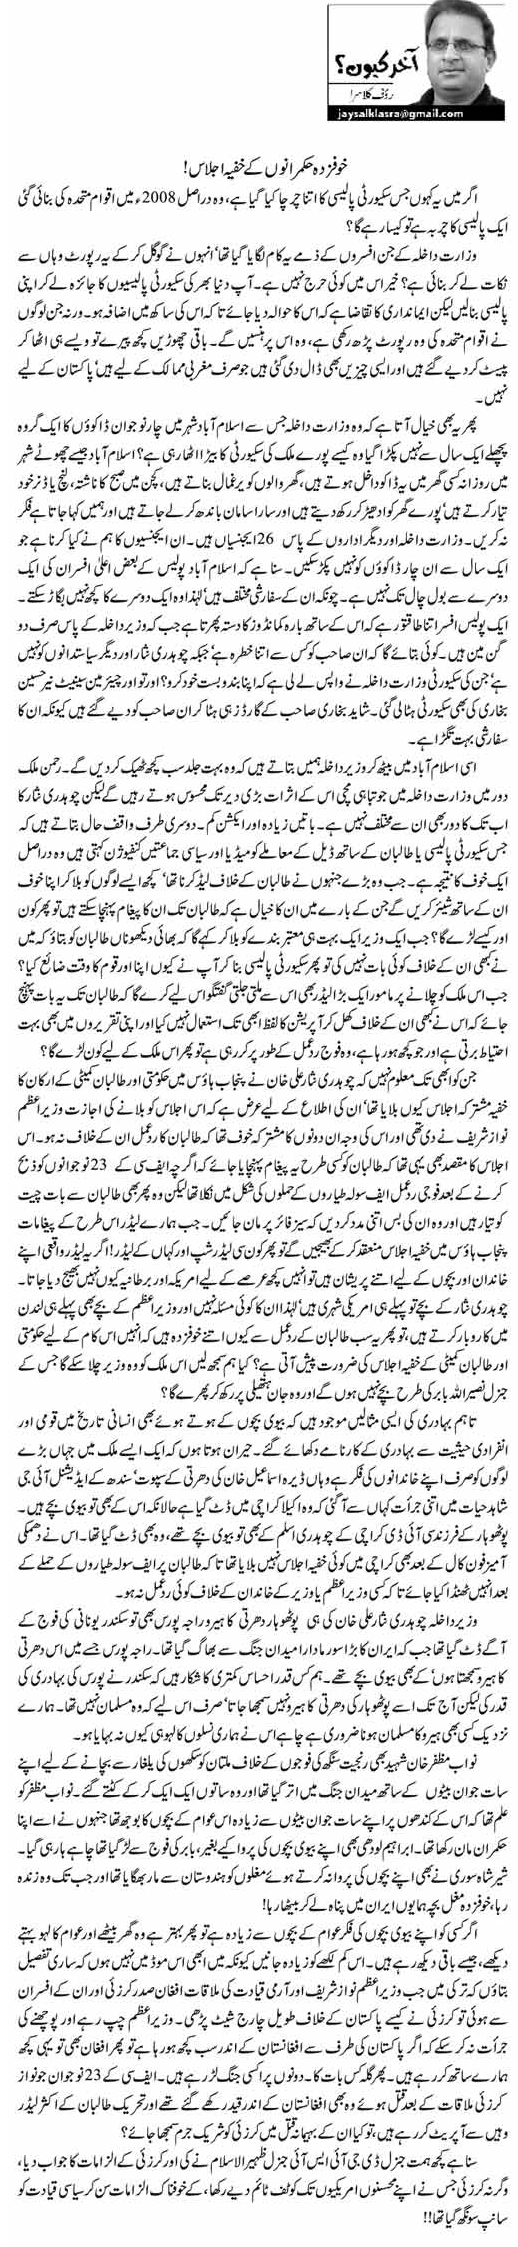 Khoufzada Hukumrano Kay Khufia Ijlas By Rauf Klasra - Pakfunny